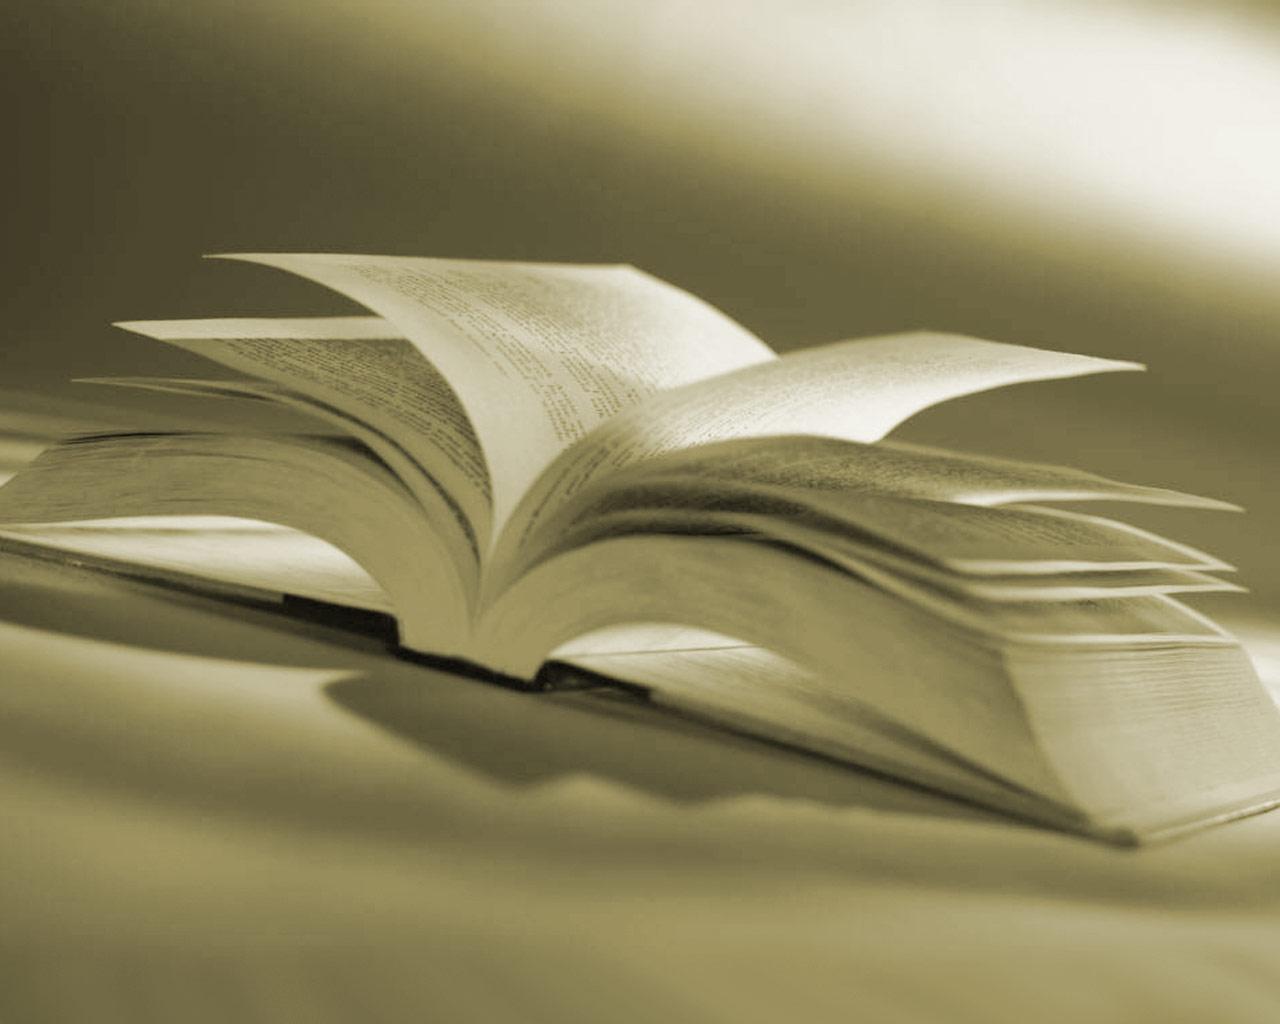 http://3.bp.blogspot.com/-YbCxFxgR9zc/TcURHGfvBZI/AAAAAAAAAGM/DbGT5YcYZIY/s1600/Books_LibraryWallpaper.jpg